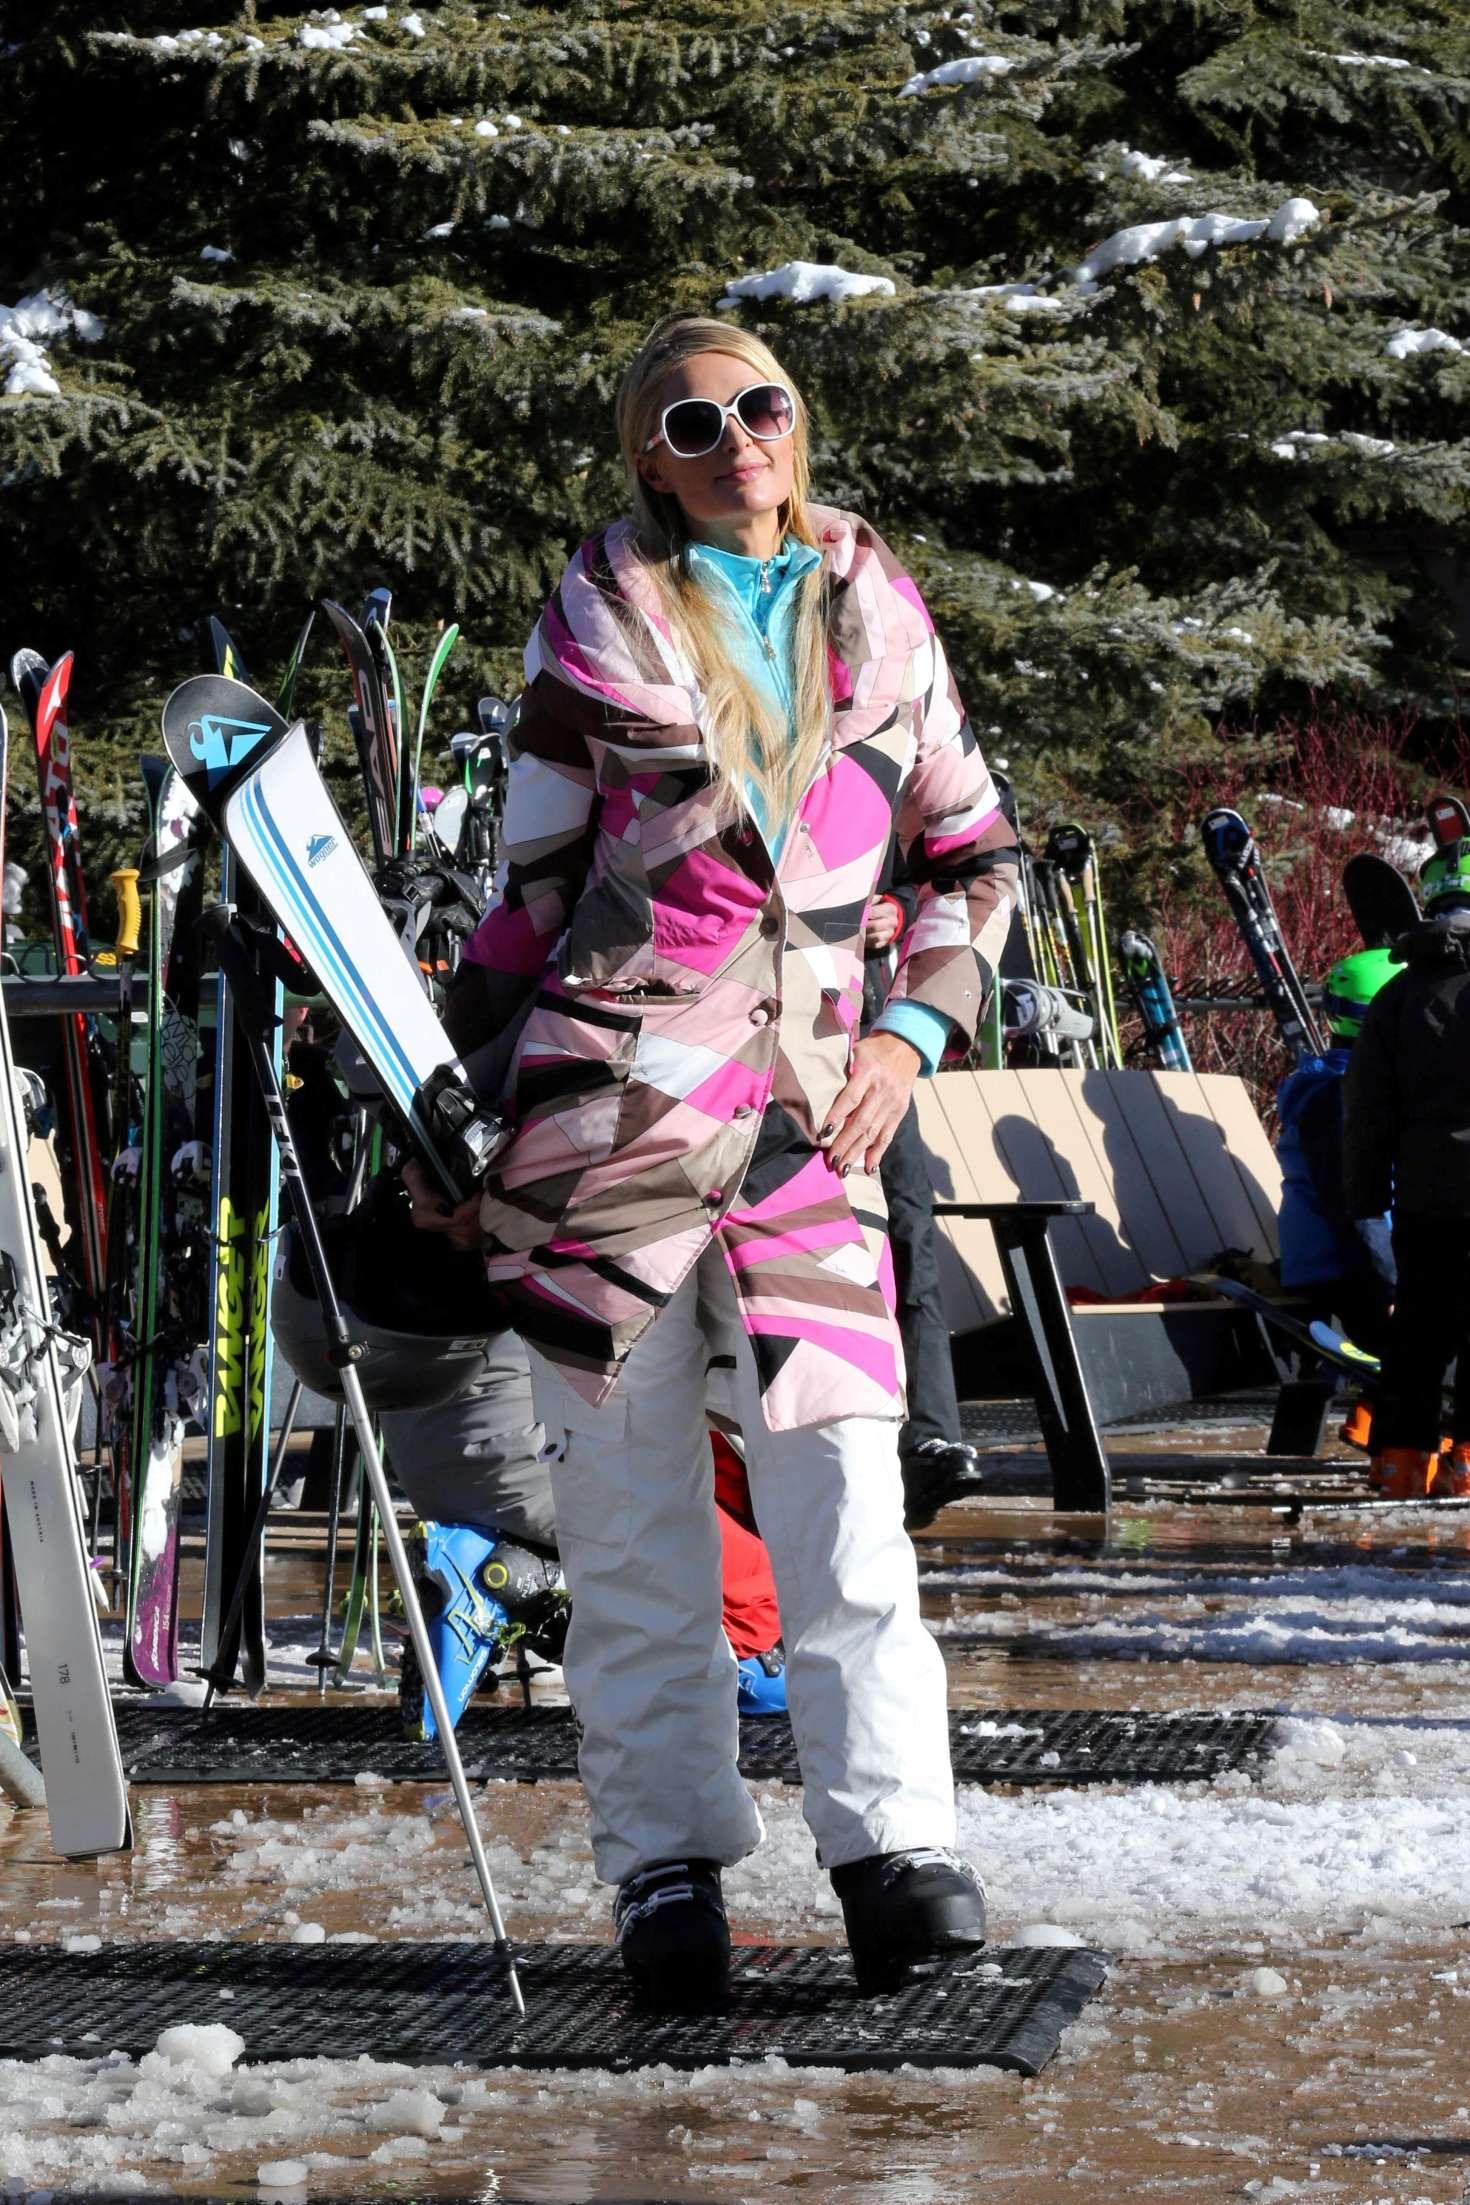 Paris Hilton 2016 : Paris Hilton Skiing in Aspen -05